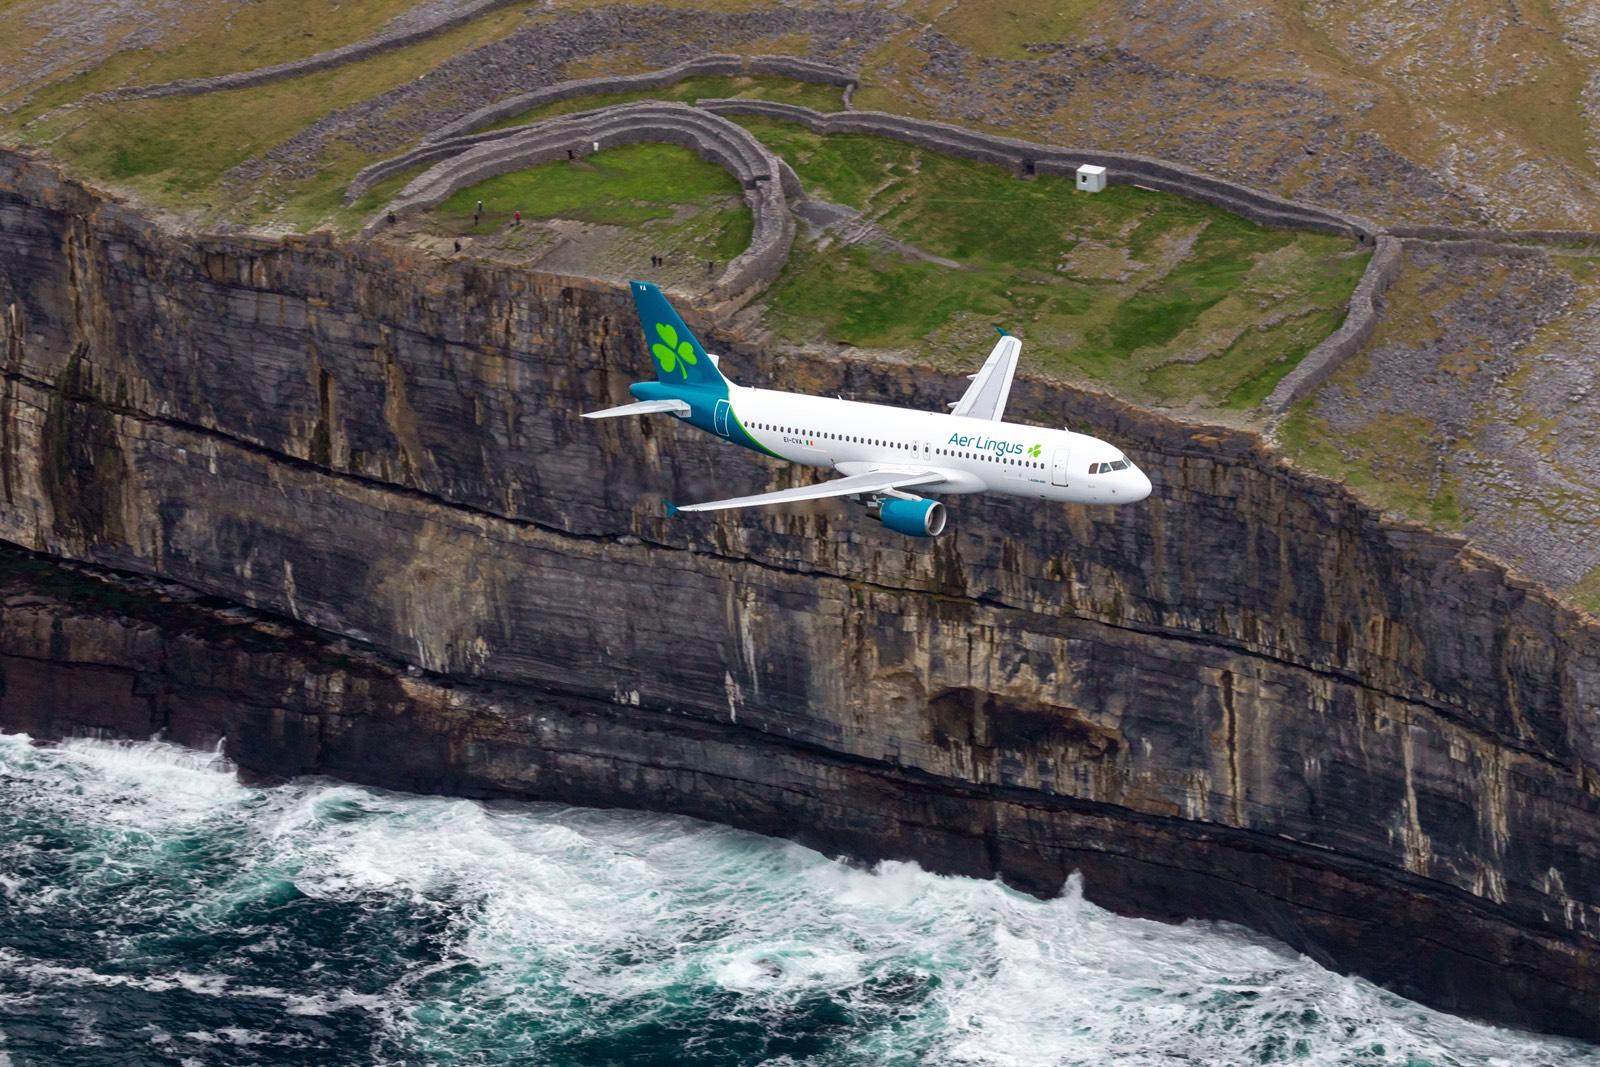 Aer Lingus_New Livery_Air to Air.jpg